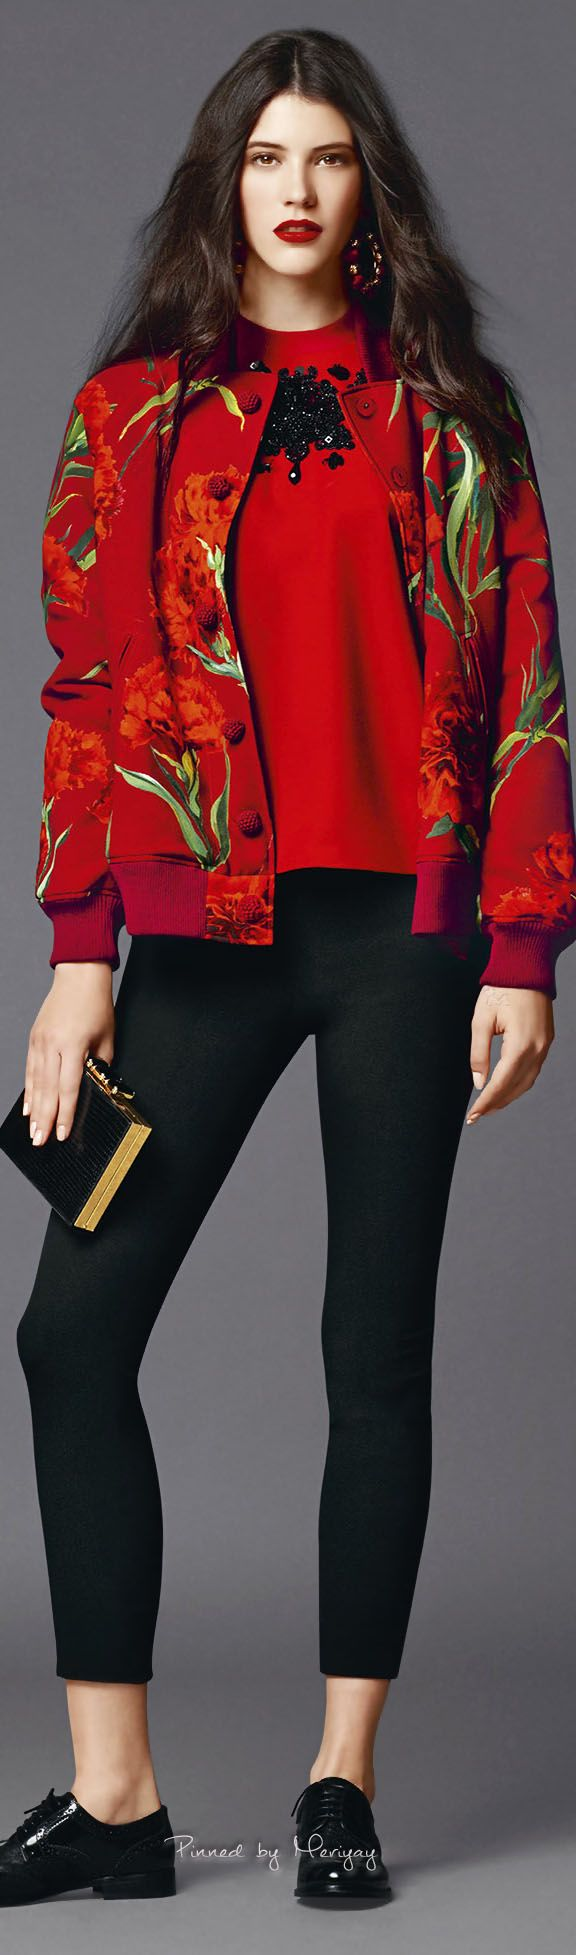 ♔Dolce & Gabbana.2015♔ .. http://escort-journal.com/  Работа для девушек за границей в Норвегии, Италии, Греции, Турции от 3000 usd за Тур. Агентство  № 1 Приглашает